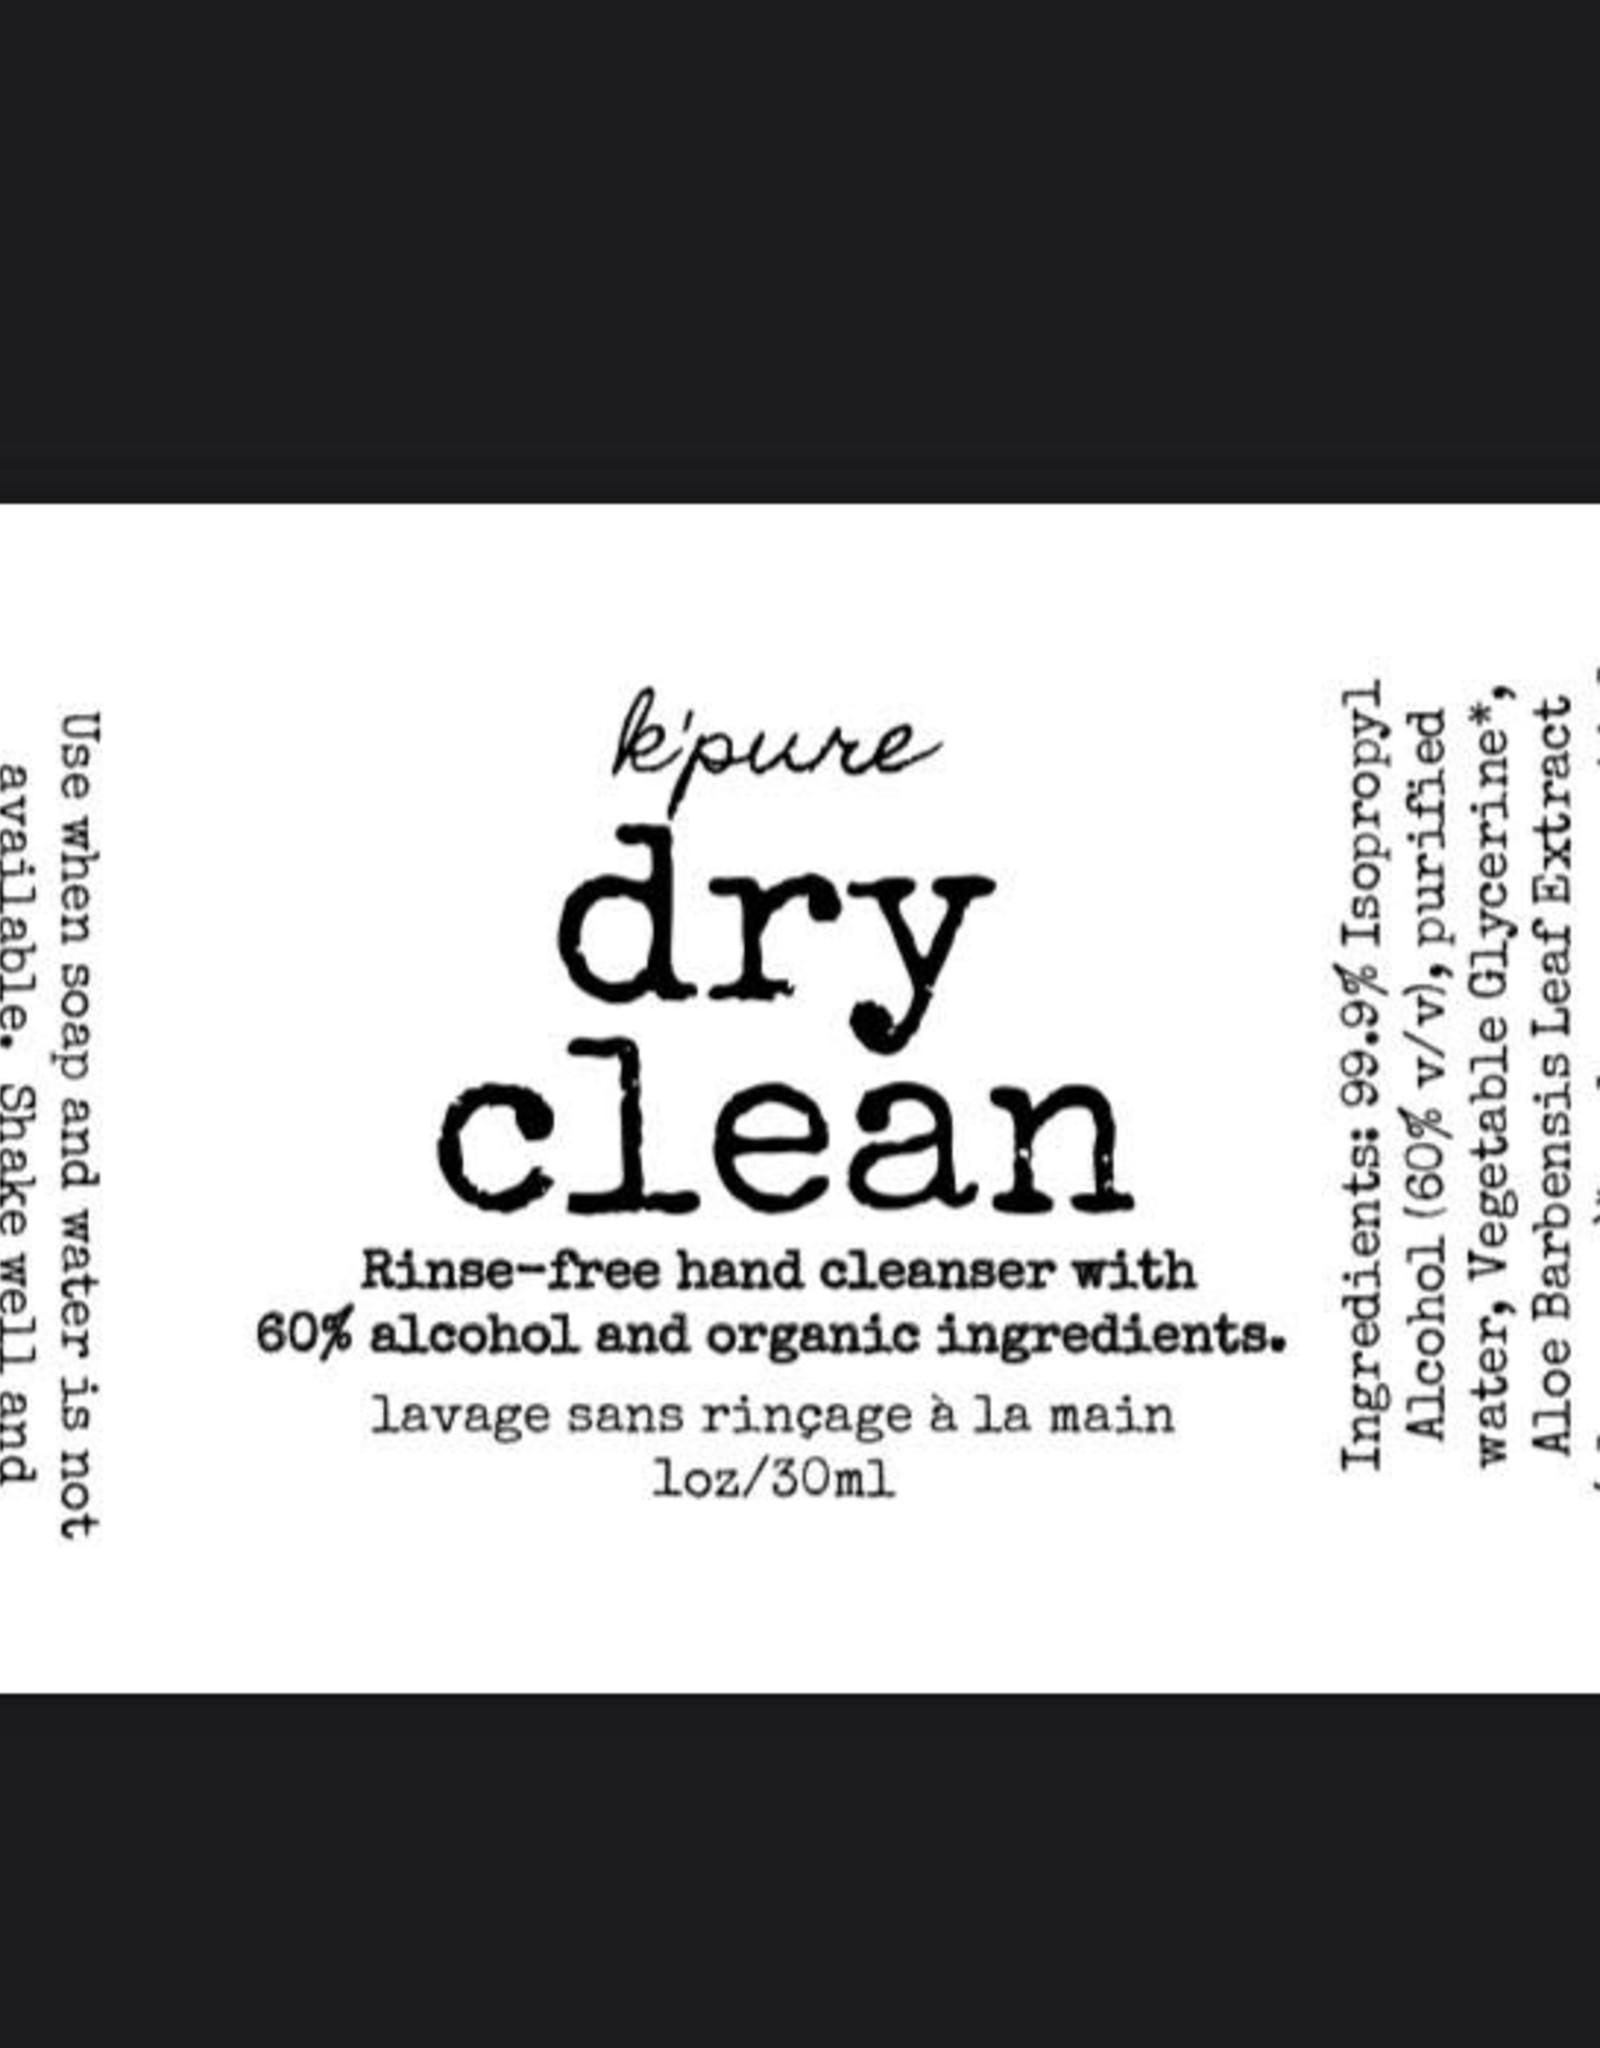 K'PURE DRY CLEAN hand sanitizer spray